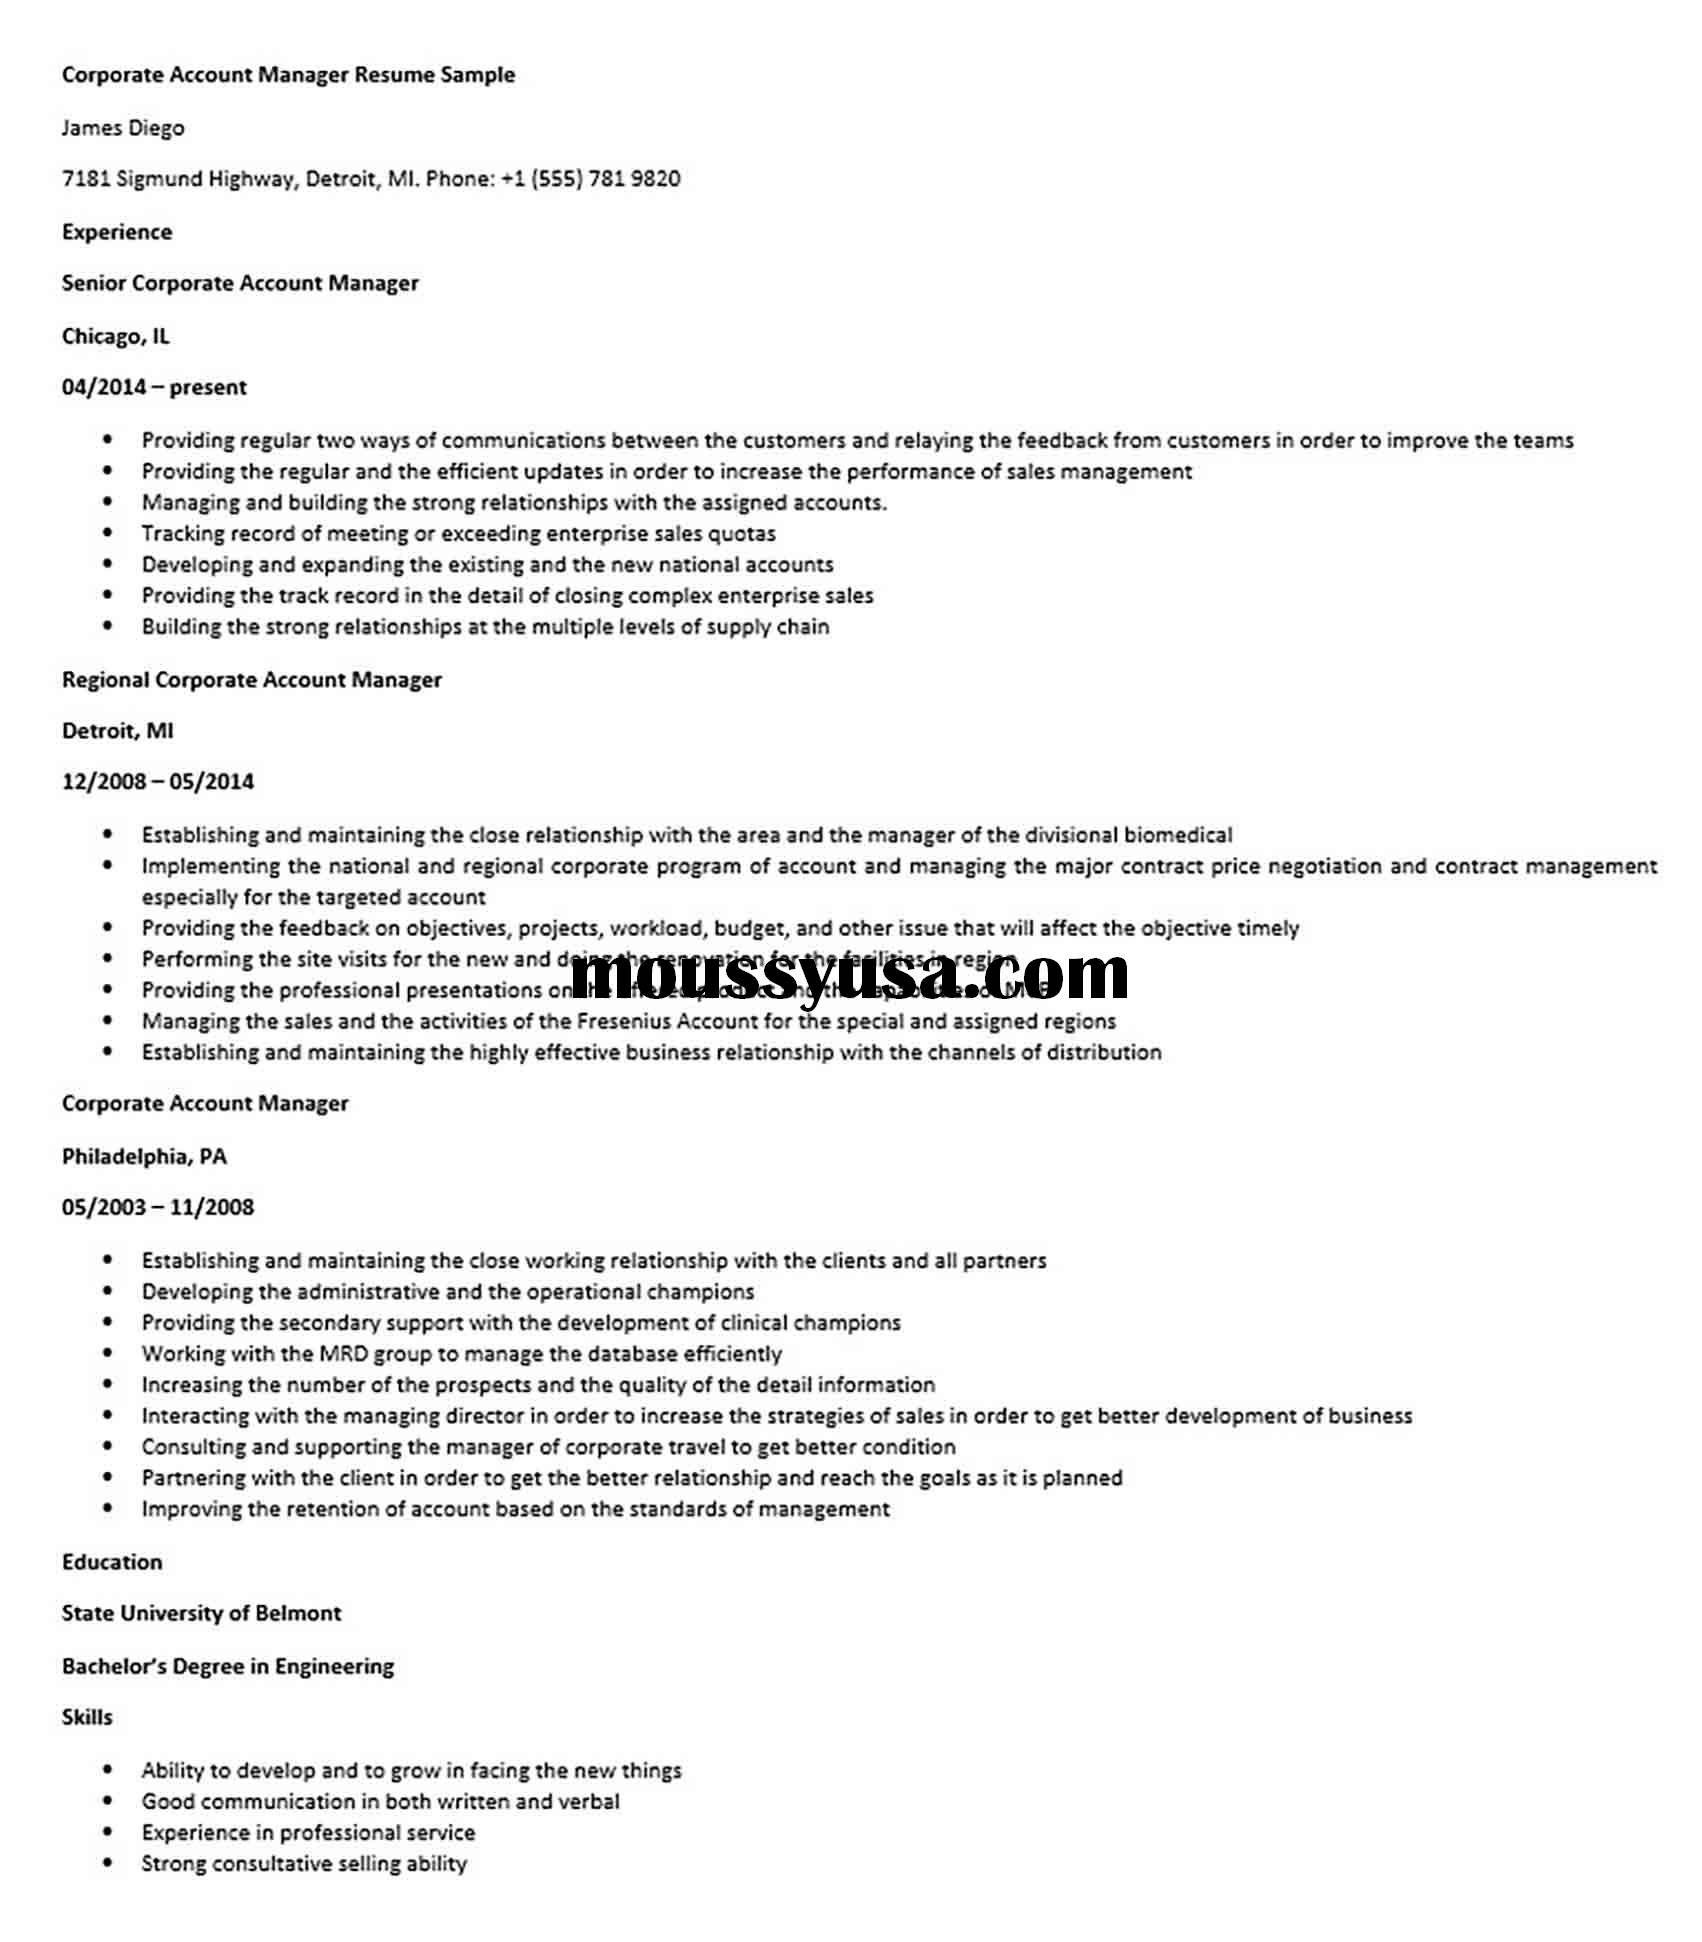 Corporate Account Manager Resume Sample di 2020